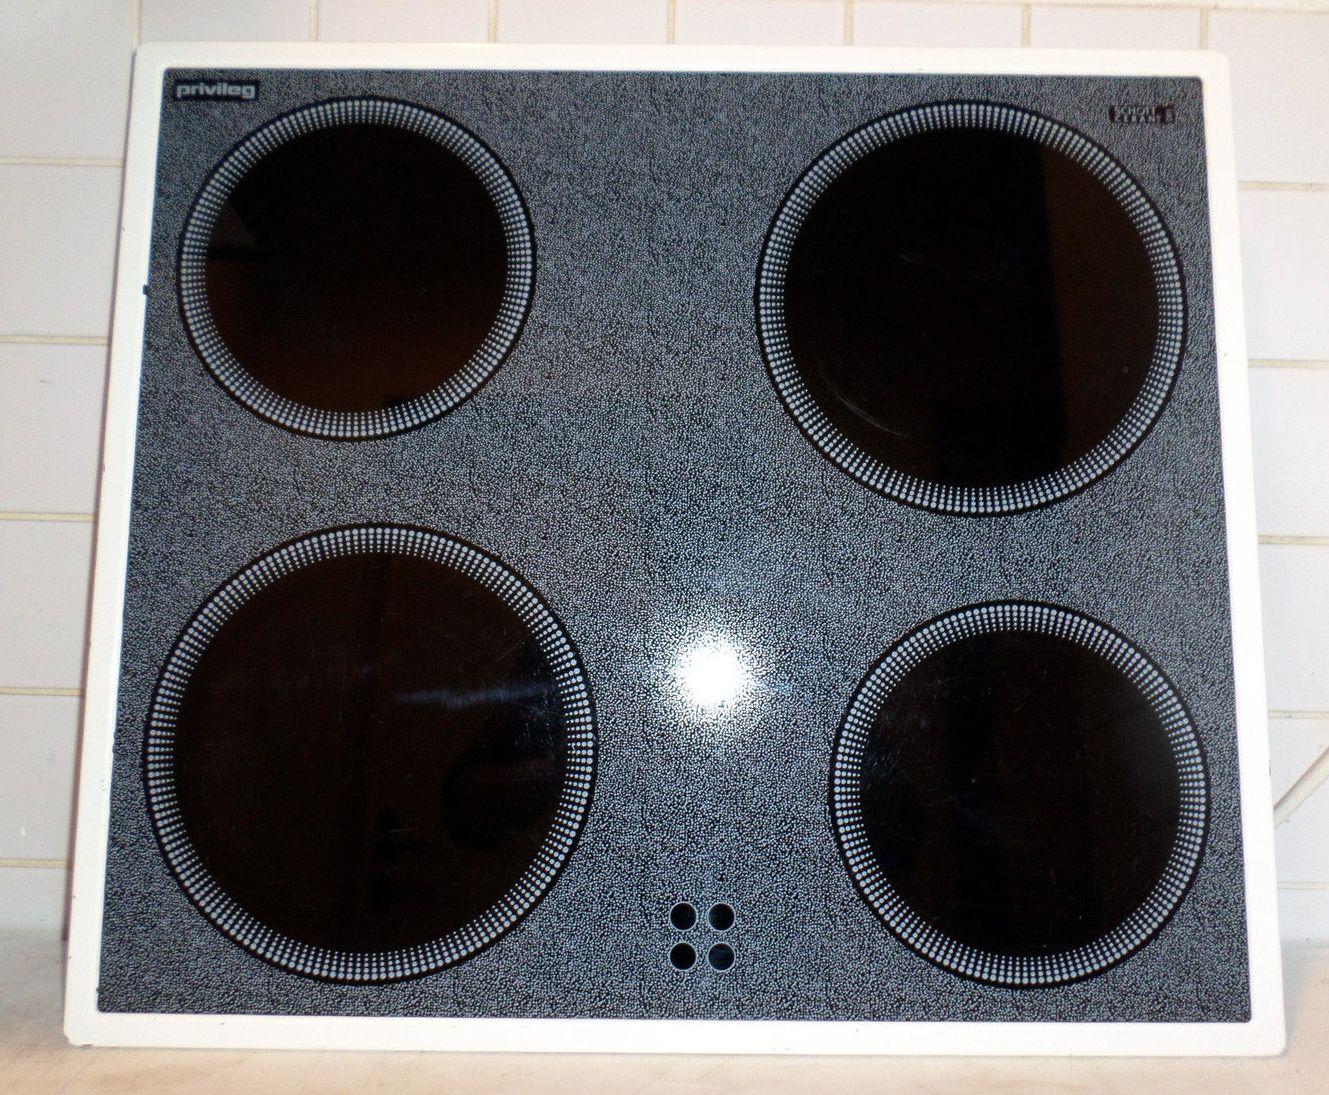 privileg gk34000 w glaskeramik kochfeld typ 55cad43zo vom. Black Bedroom Furniture Sets. Home Design Ideas